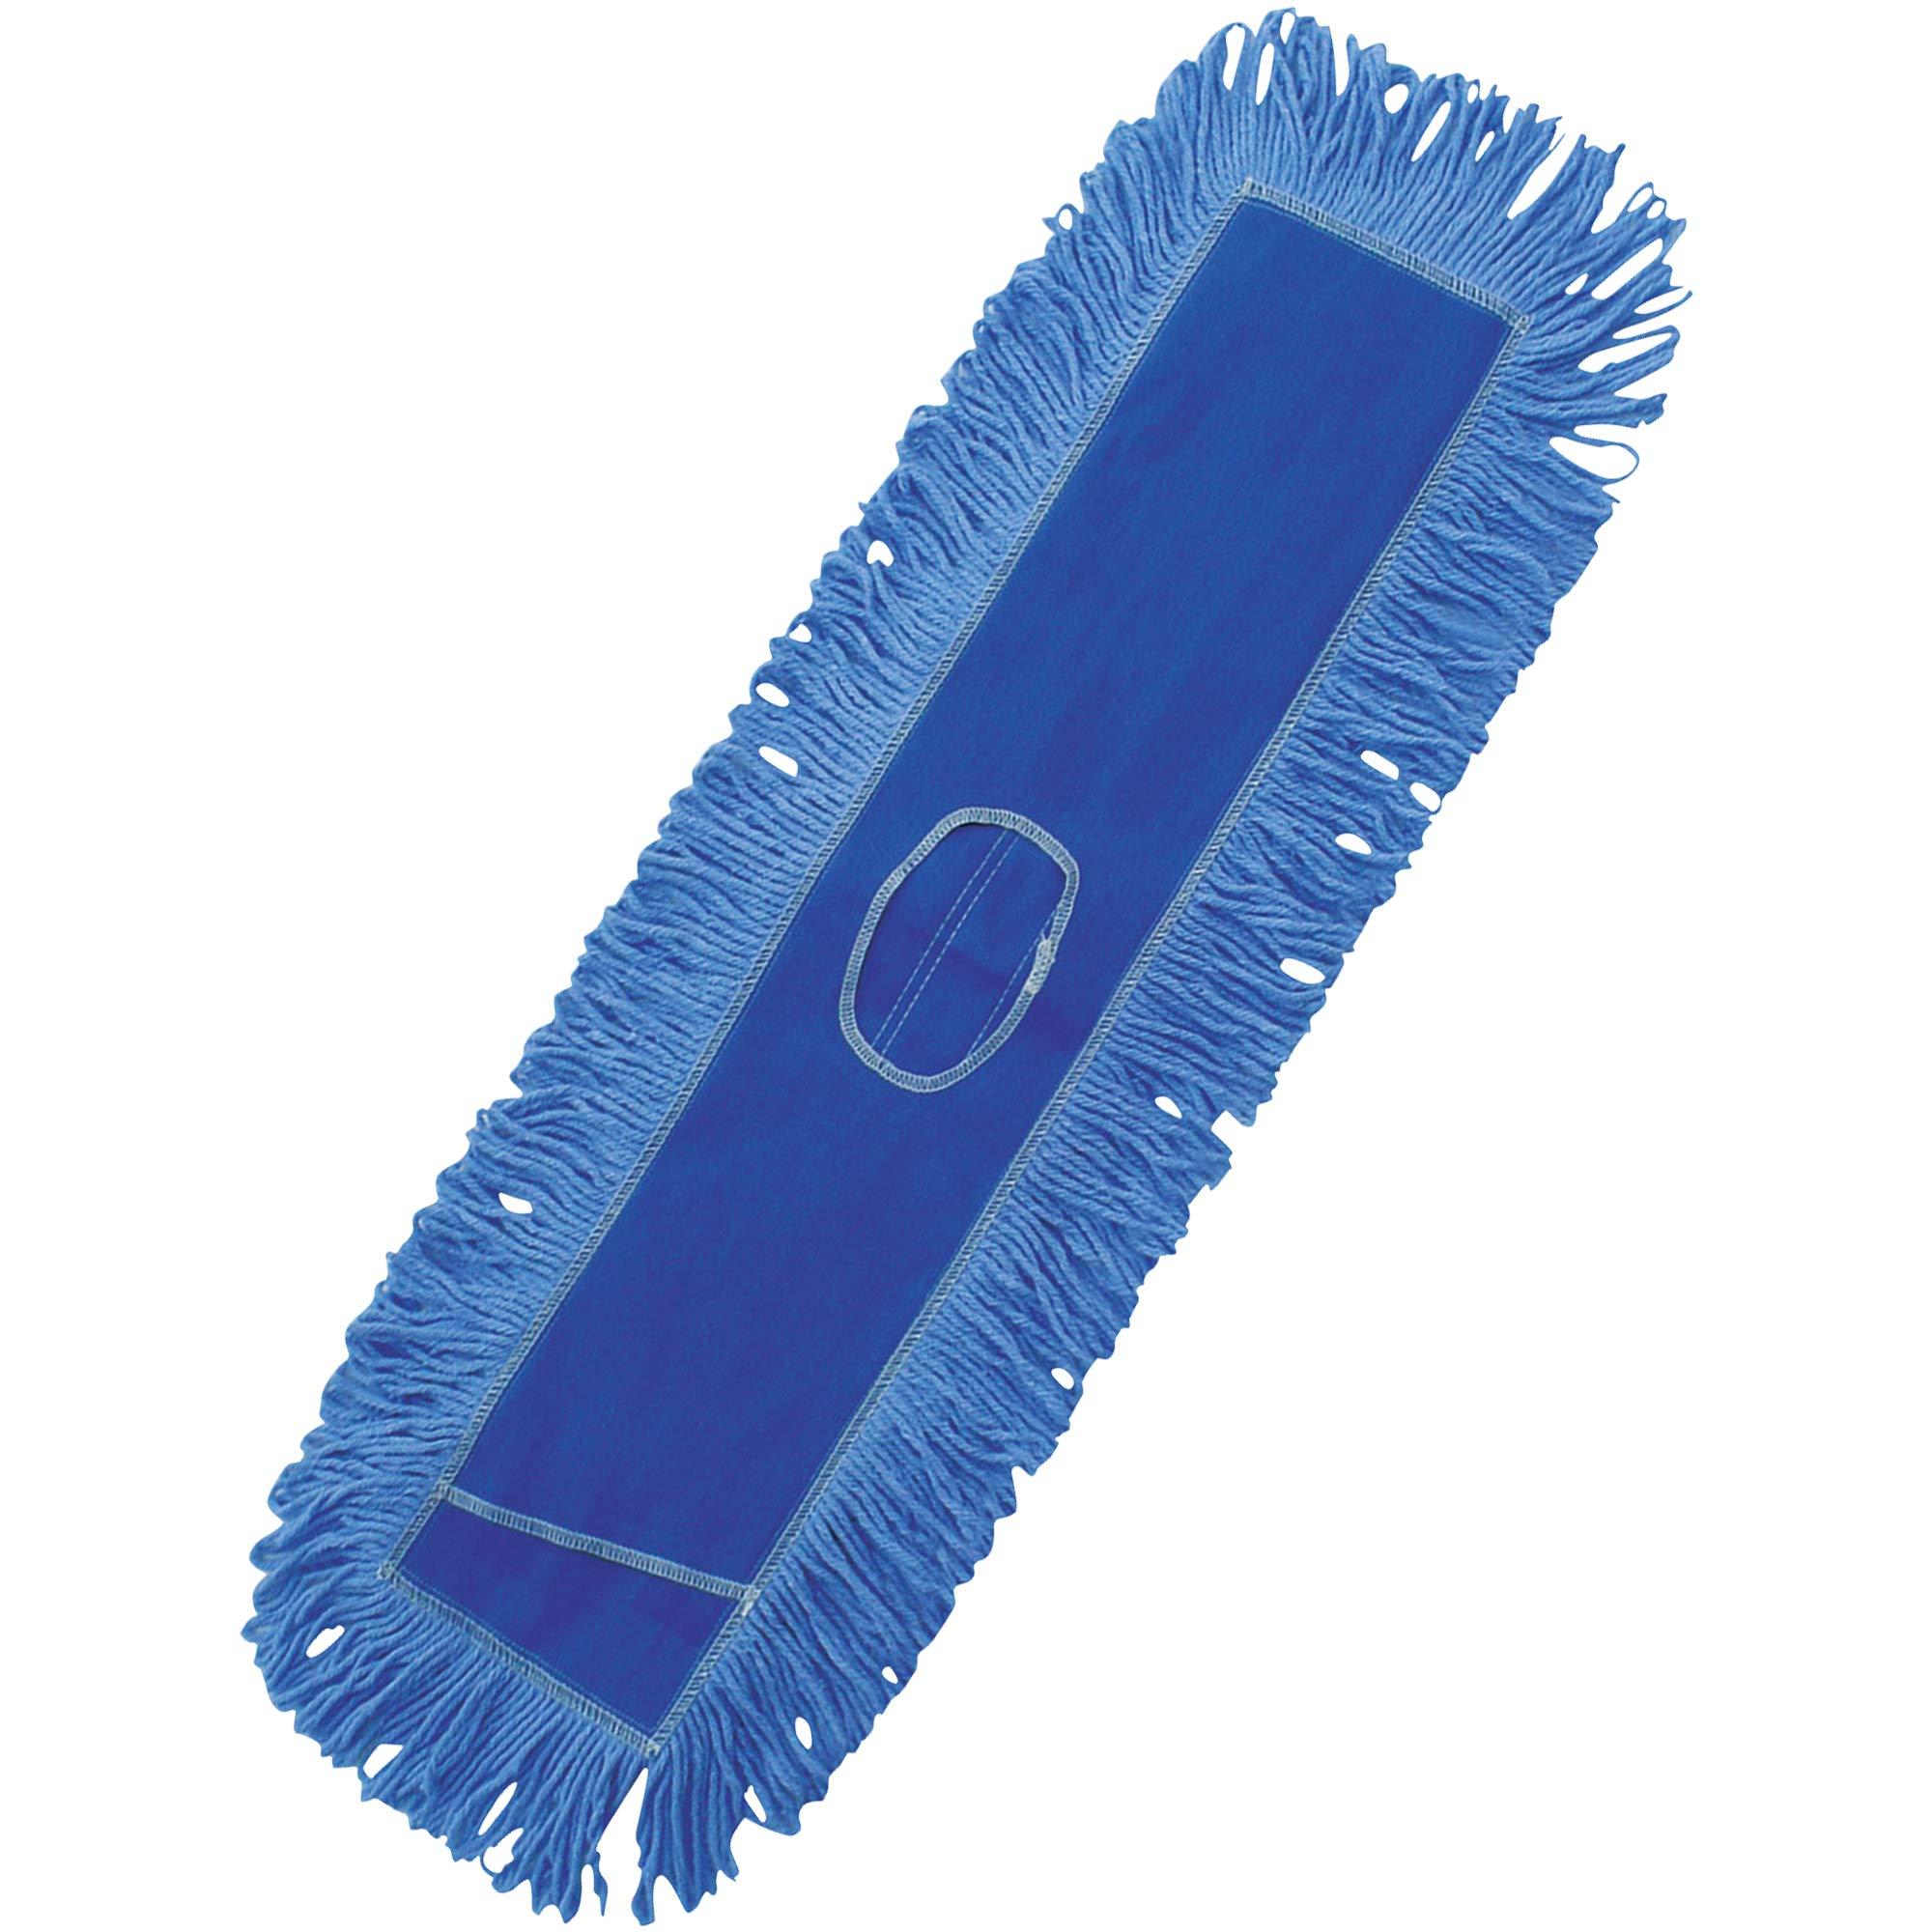 Deluxe Looped-End Dust Mop Head, 36'', Blue, 1/Each